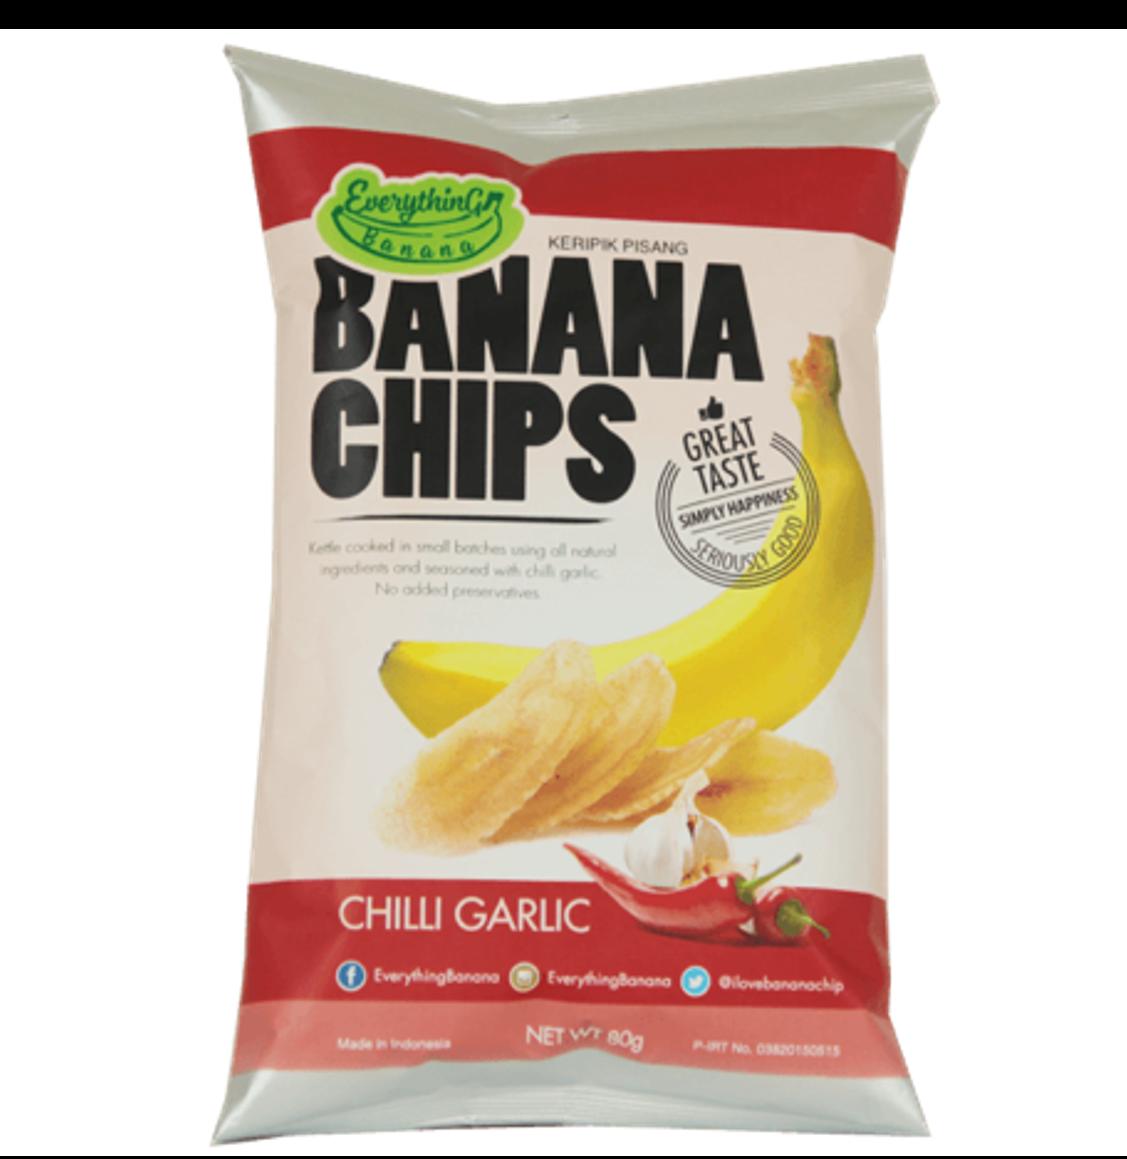 Everything Banana Chips - Garlic Chilli, 80g